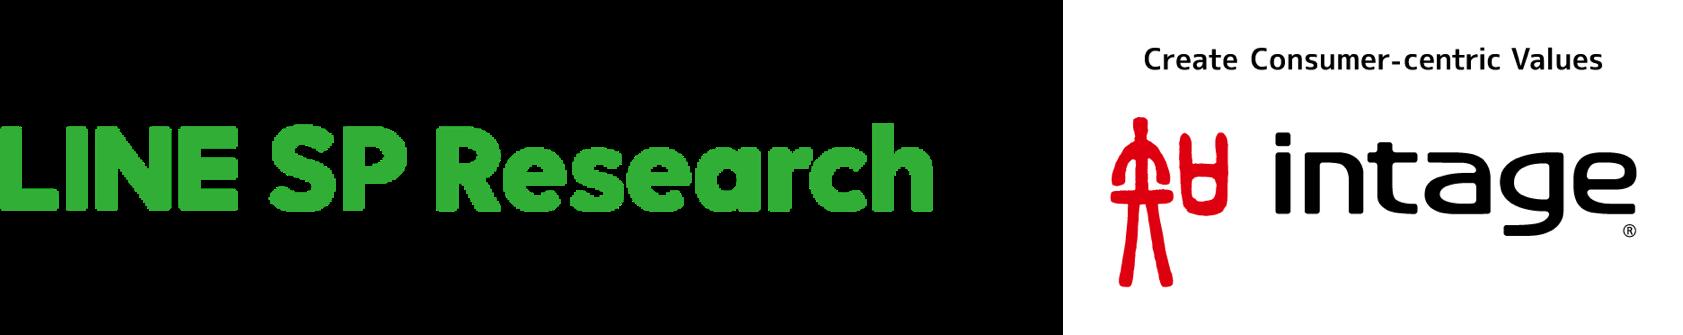 /stf/linecorp/en/pr/spresearch.png